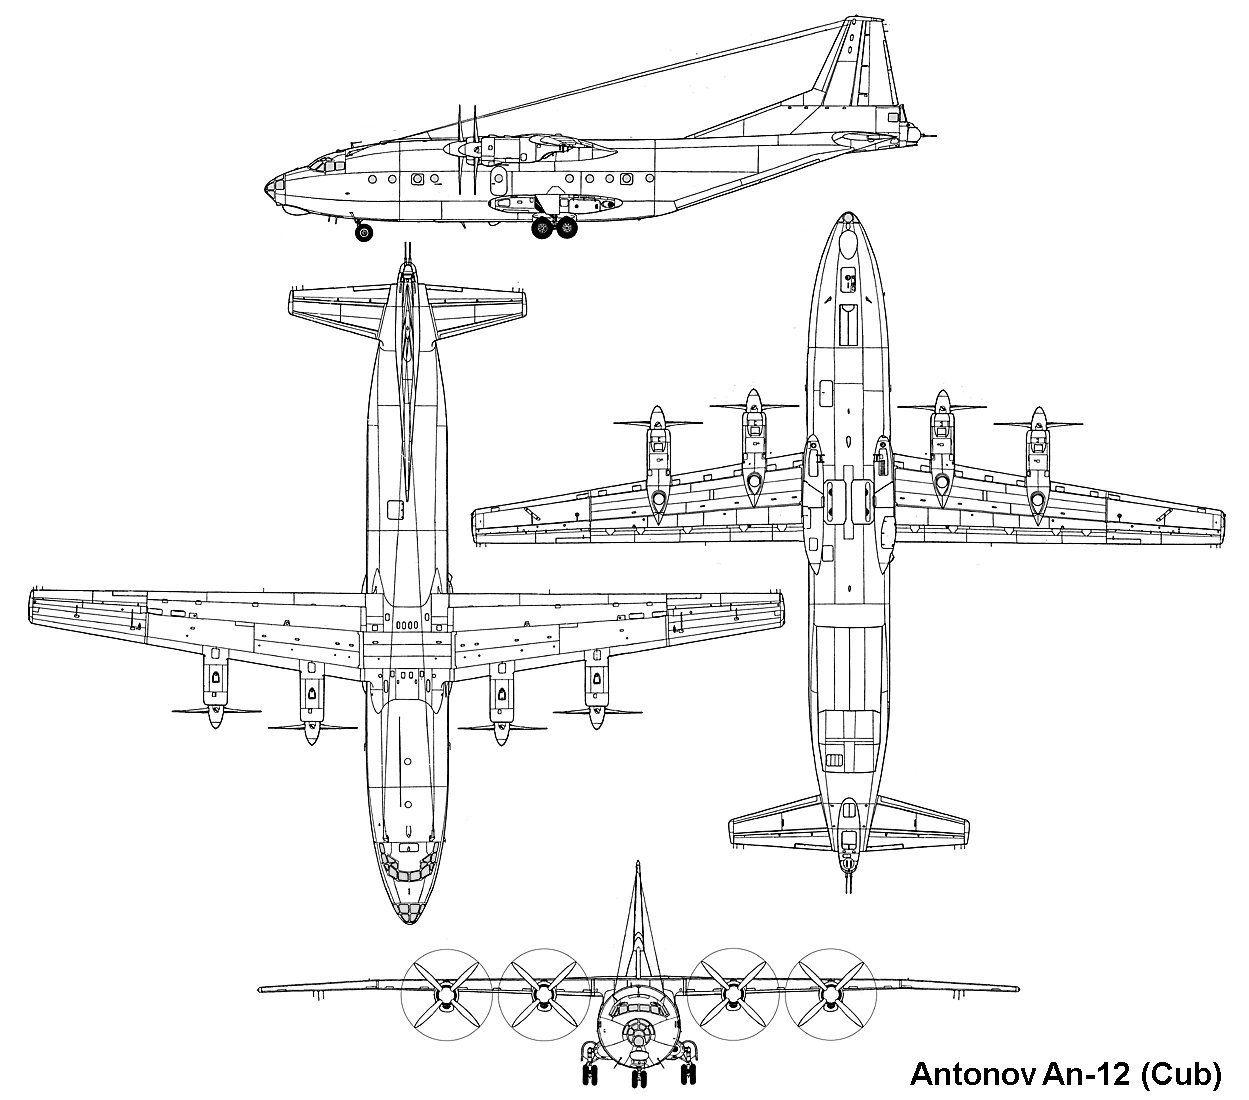 Antonov An 12 Cub